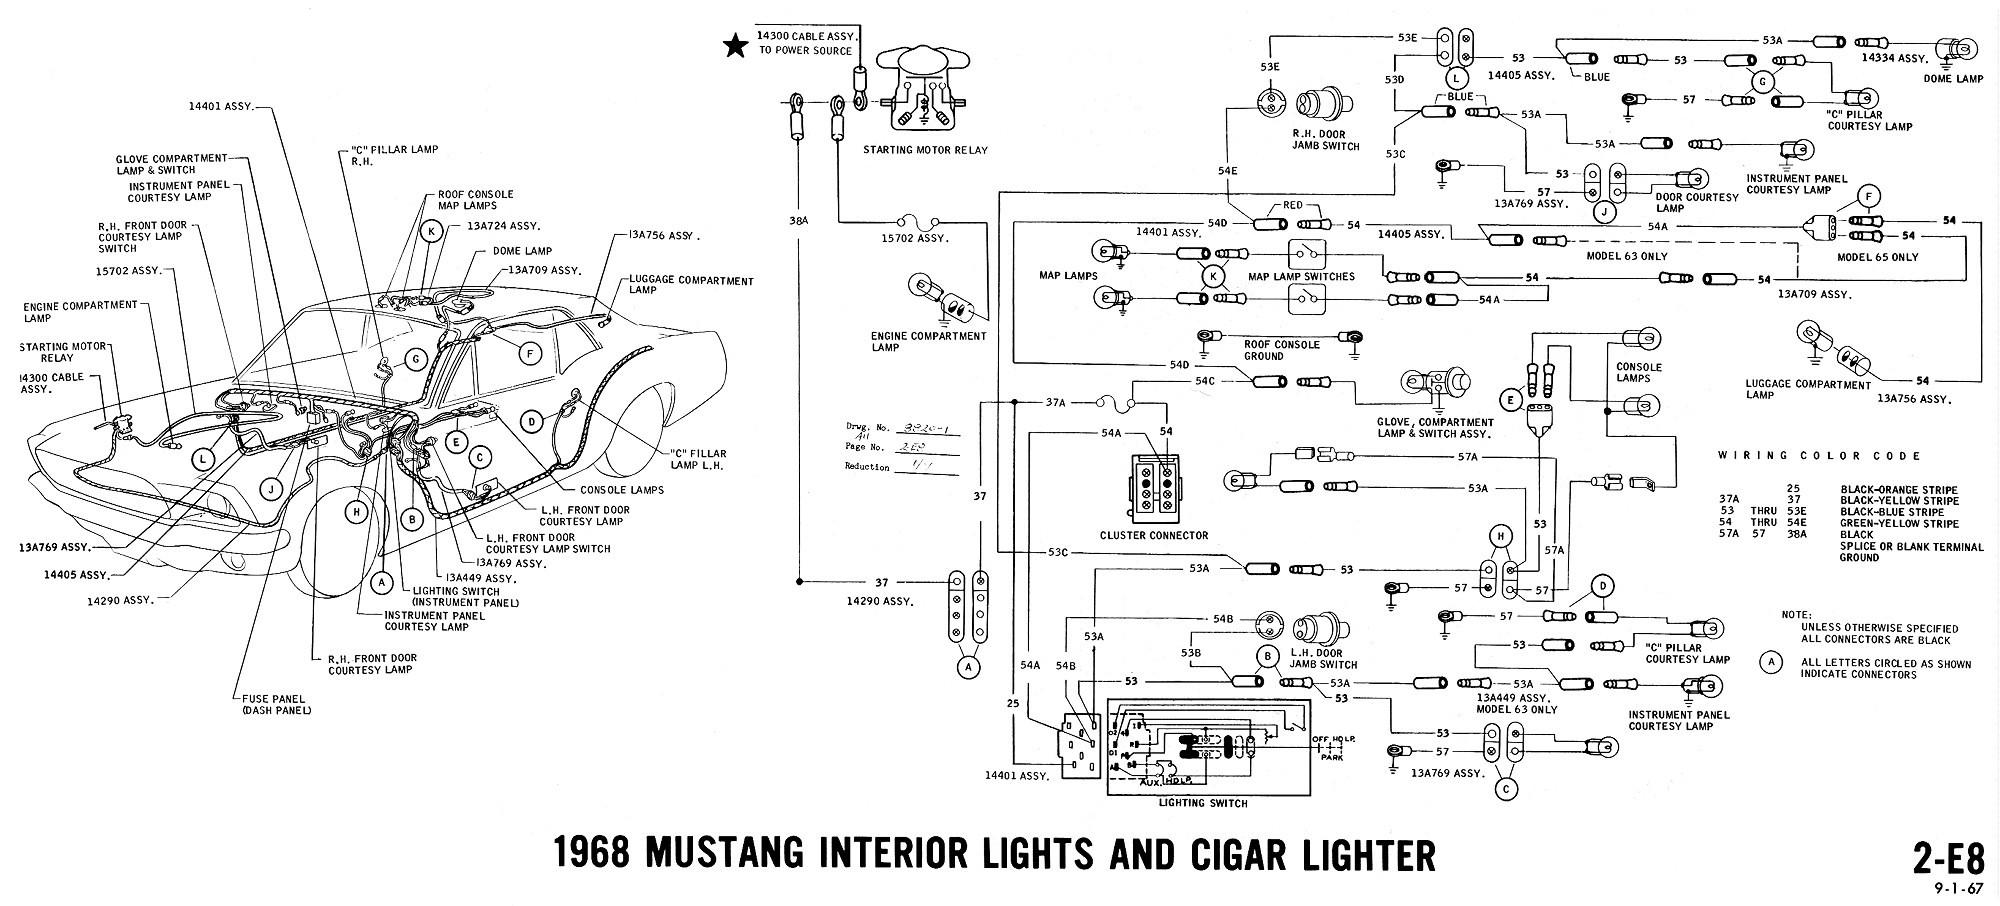 95 ford ranger alternator wiring diagram keystone cougar diagrams 1968 solenoid data site